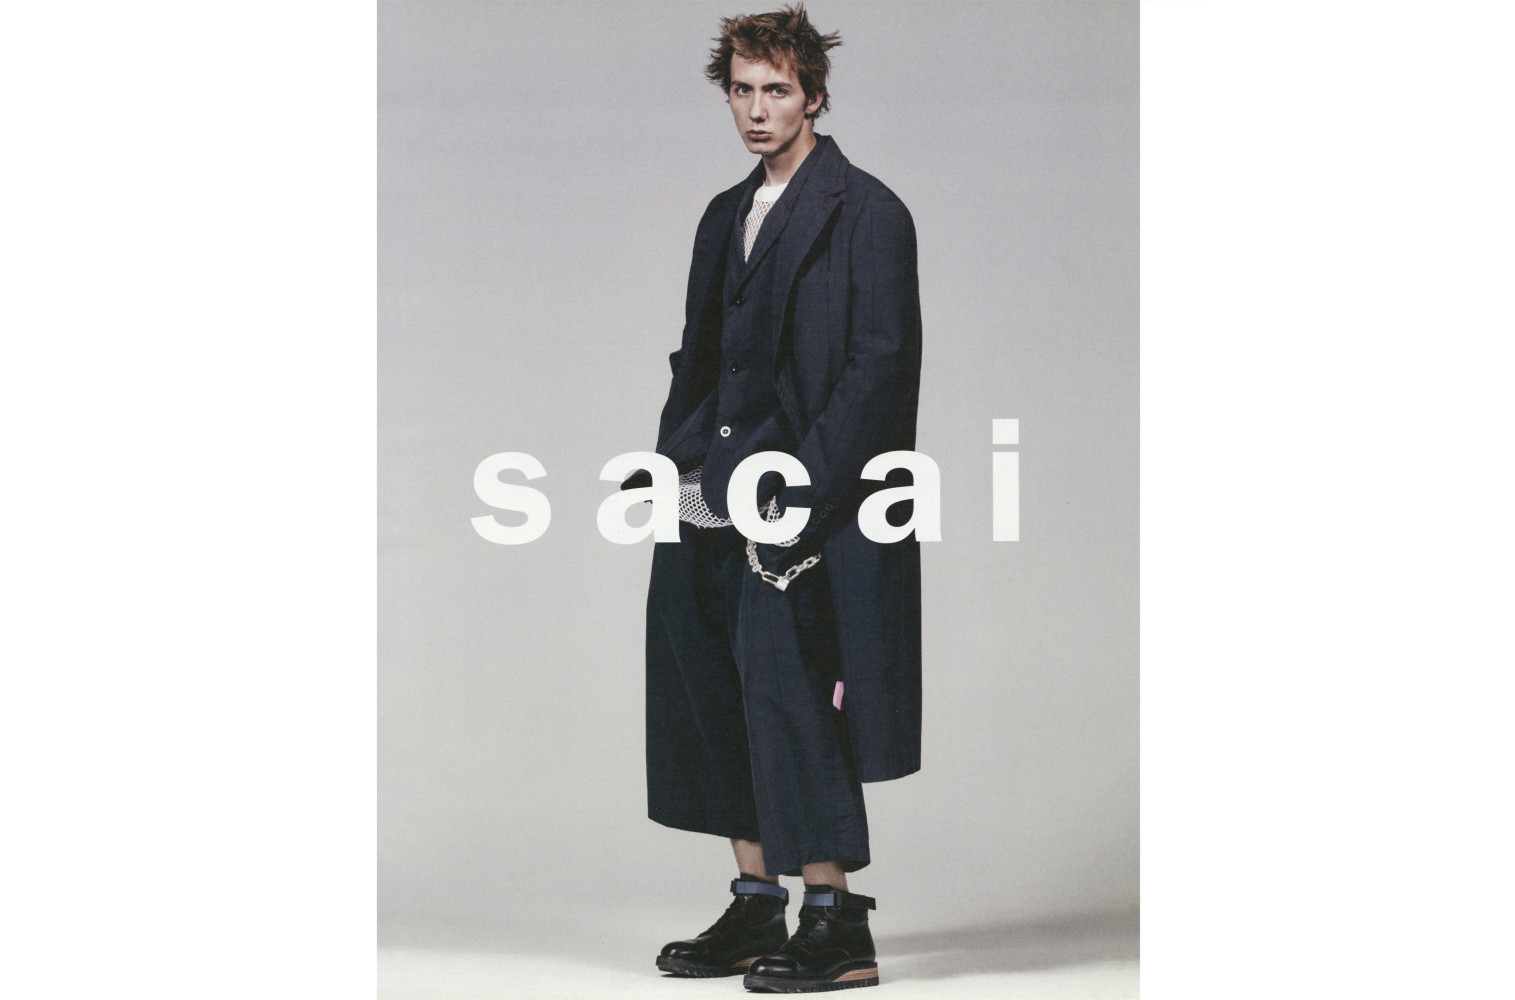 Sacai SS17 campaign